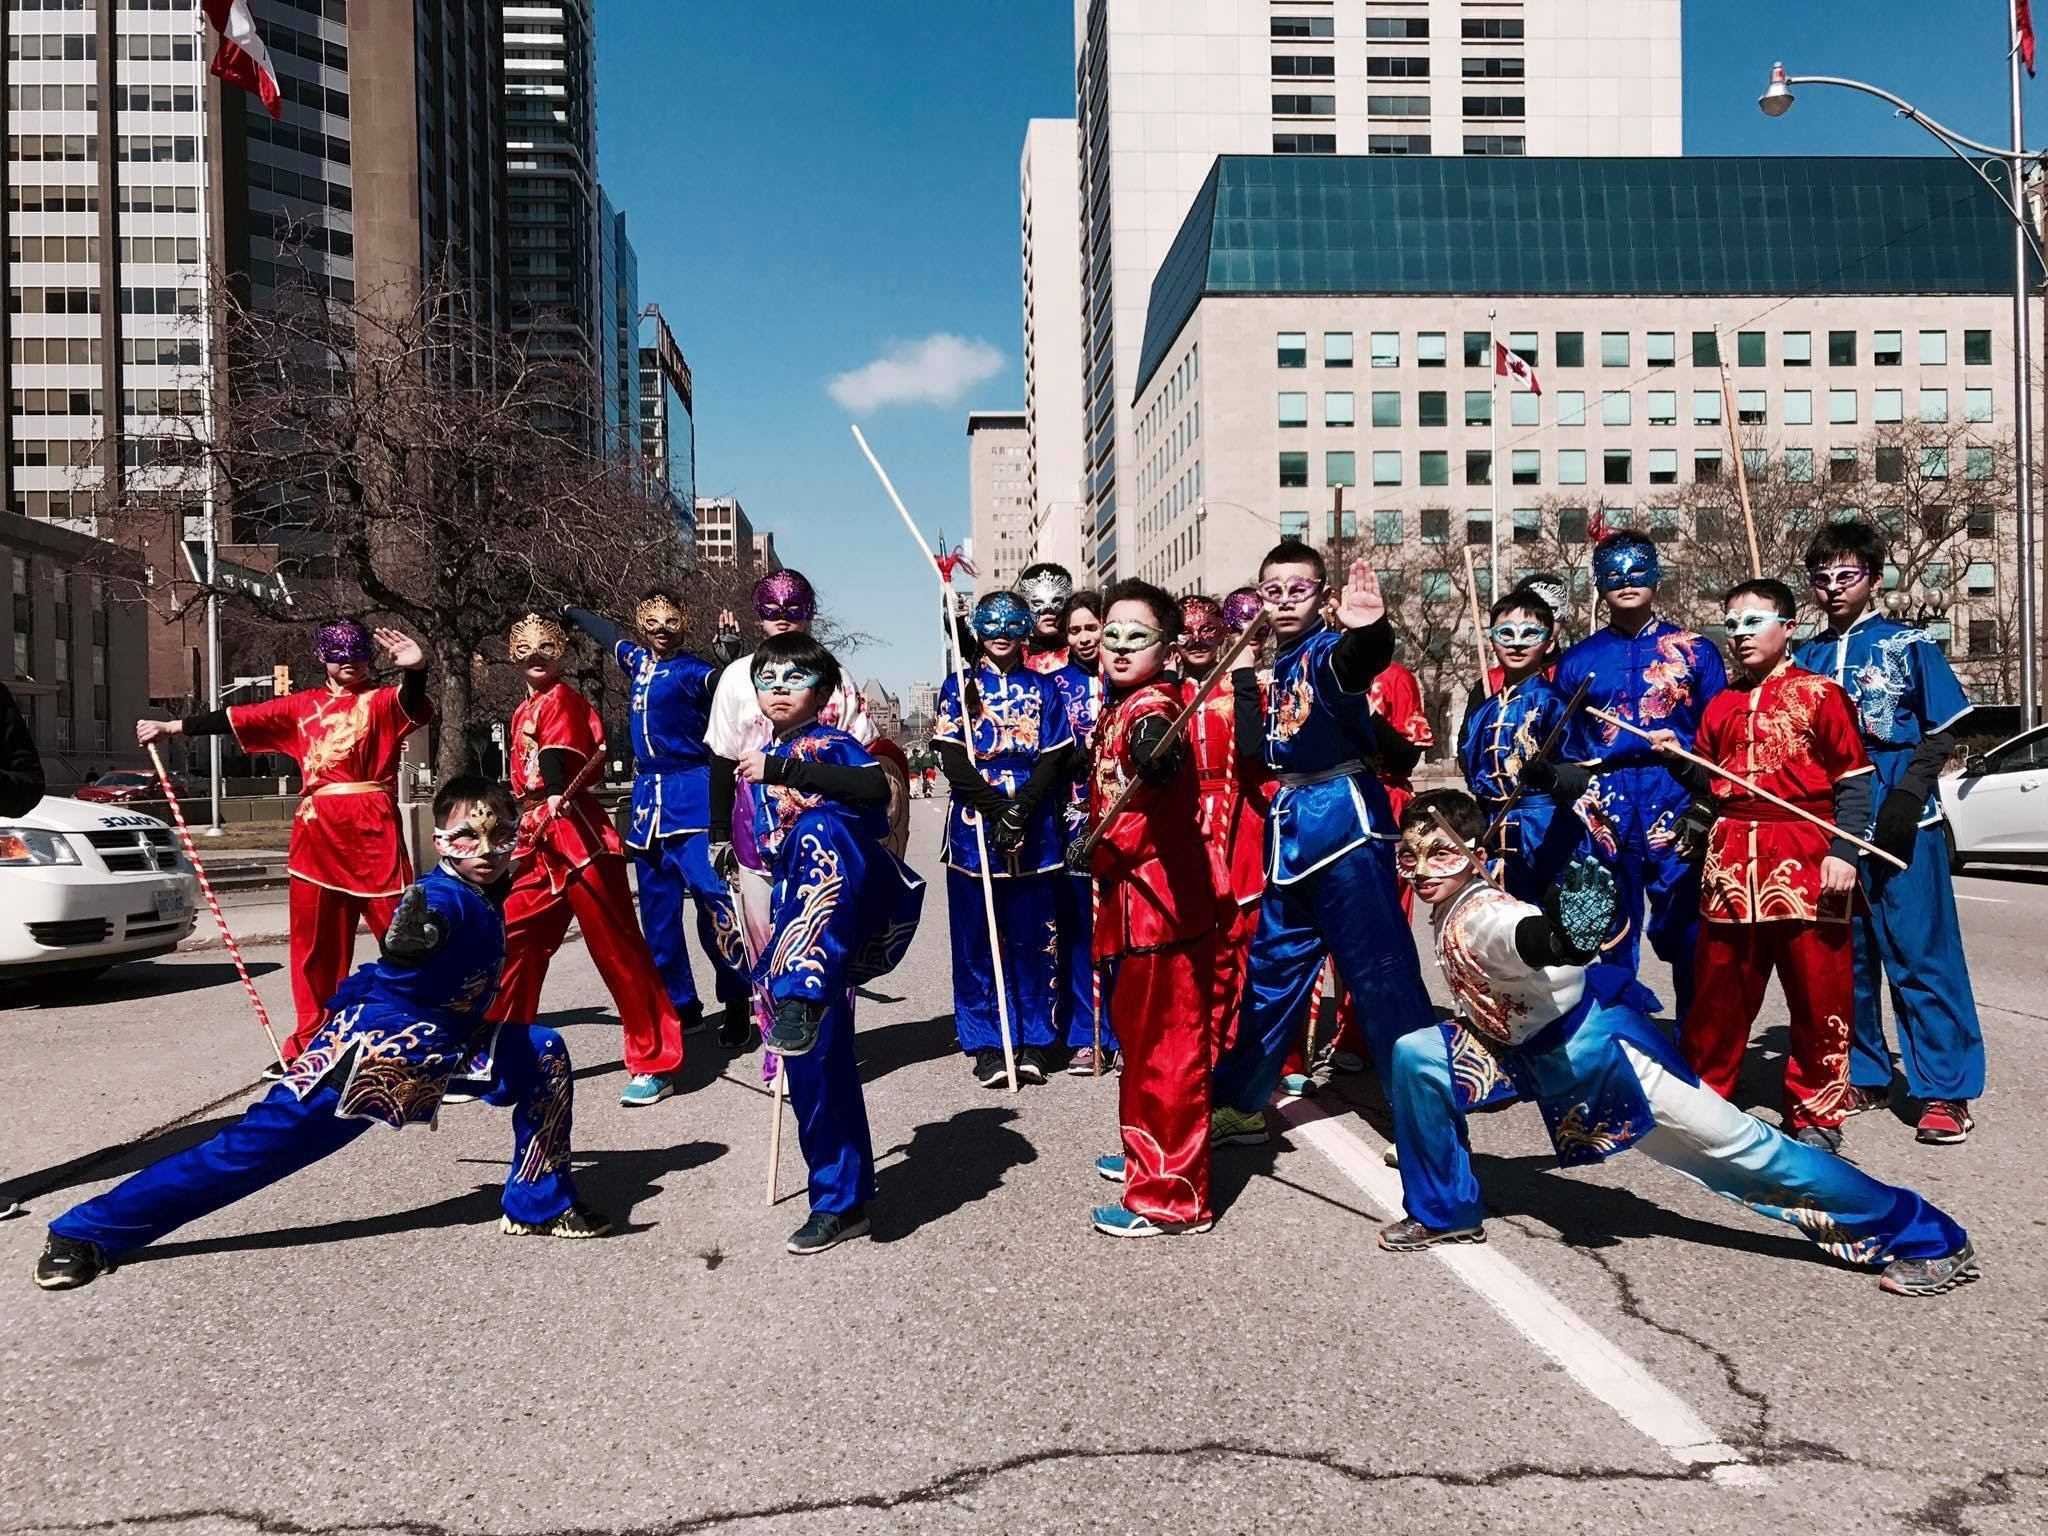 wayland-li-wushu-toronto-st-patricks-day-parade-2017-2.JPG